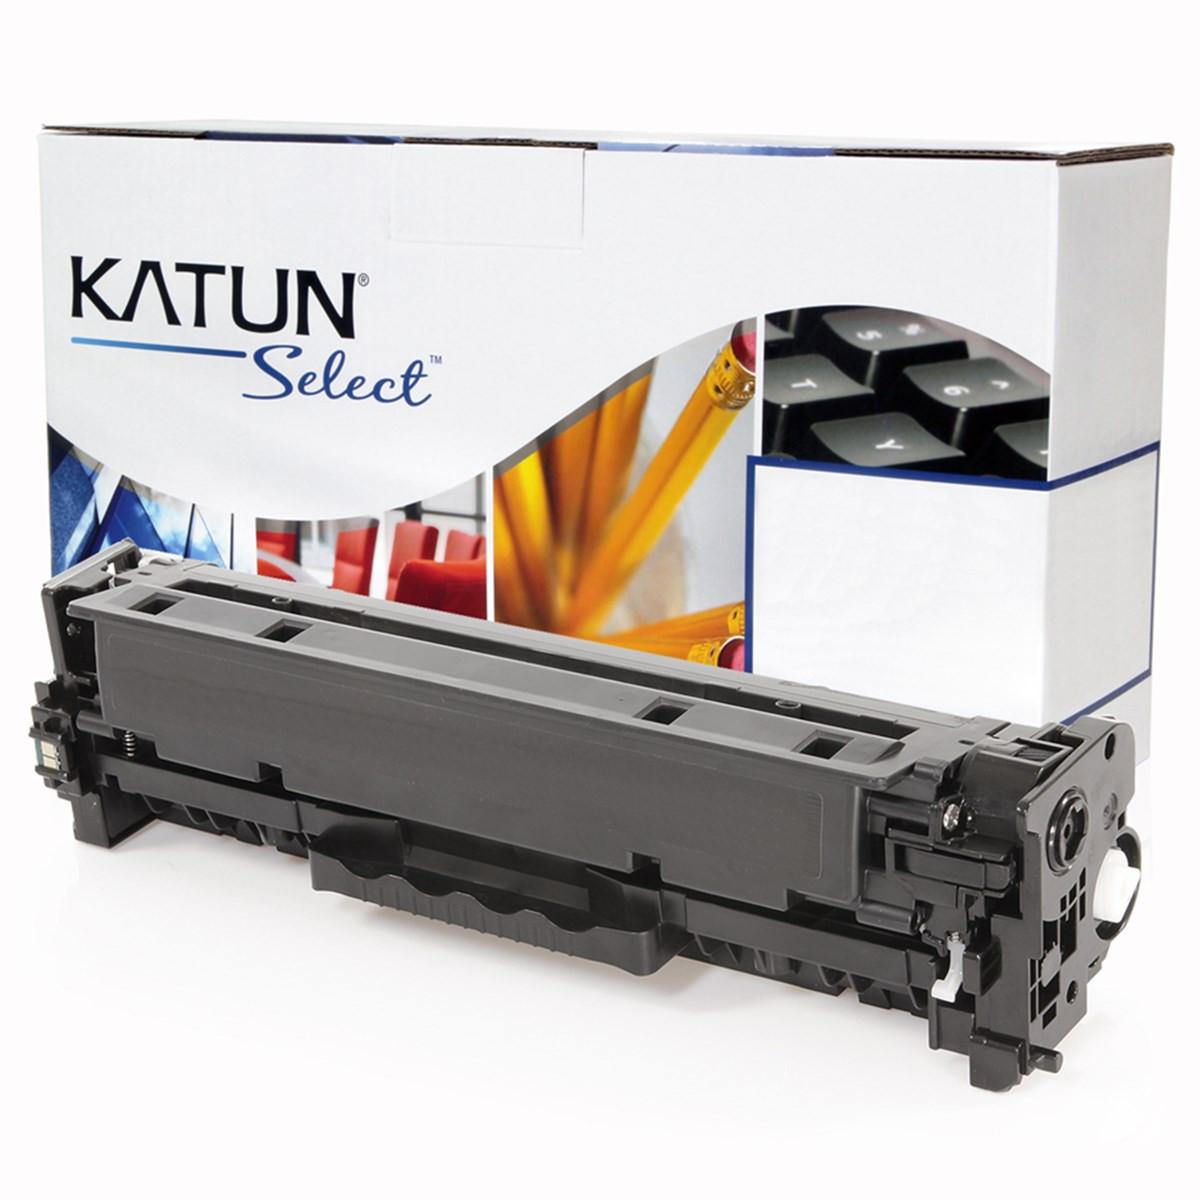 Toner Compatível com HP CC531A 304A Ciano | CM2320NF CP2020 CP2025 CM2320FXI | Katun Select 2.8k